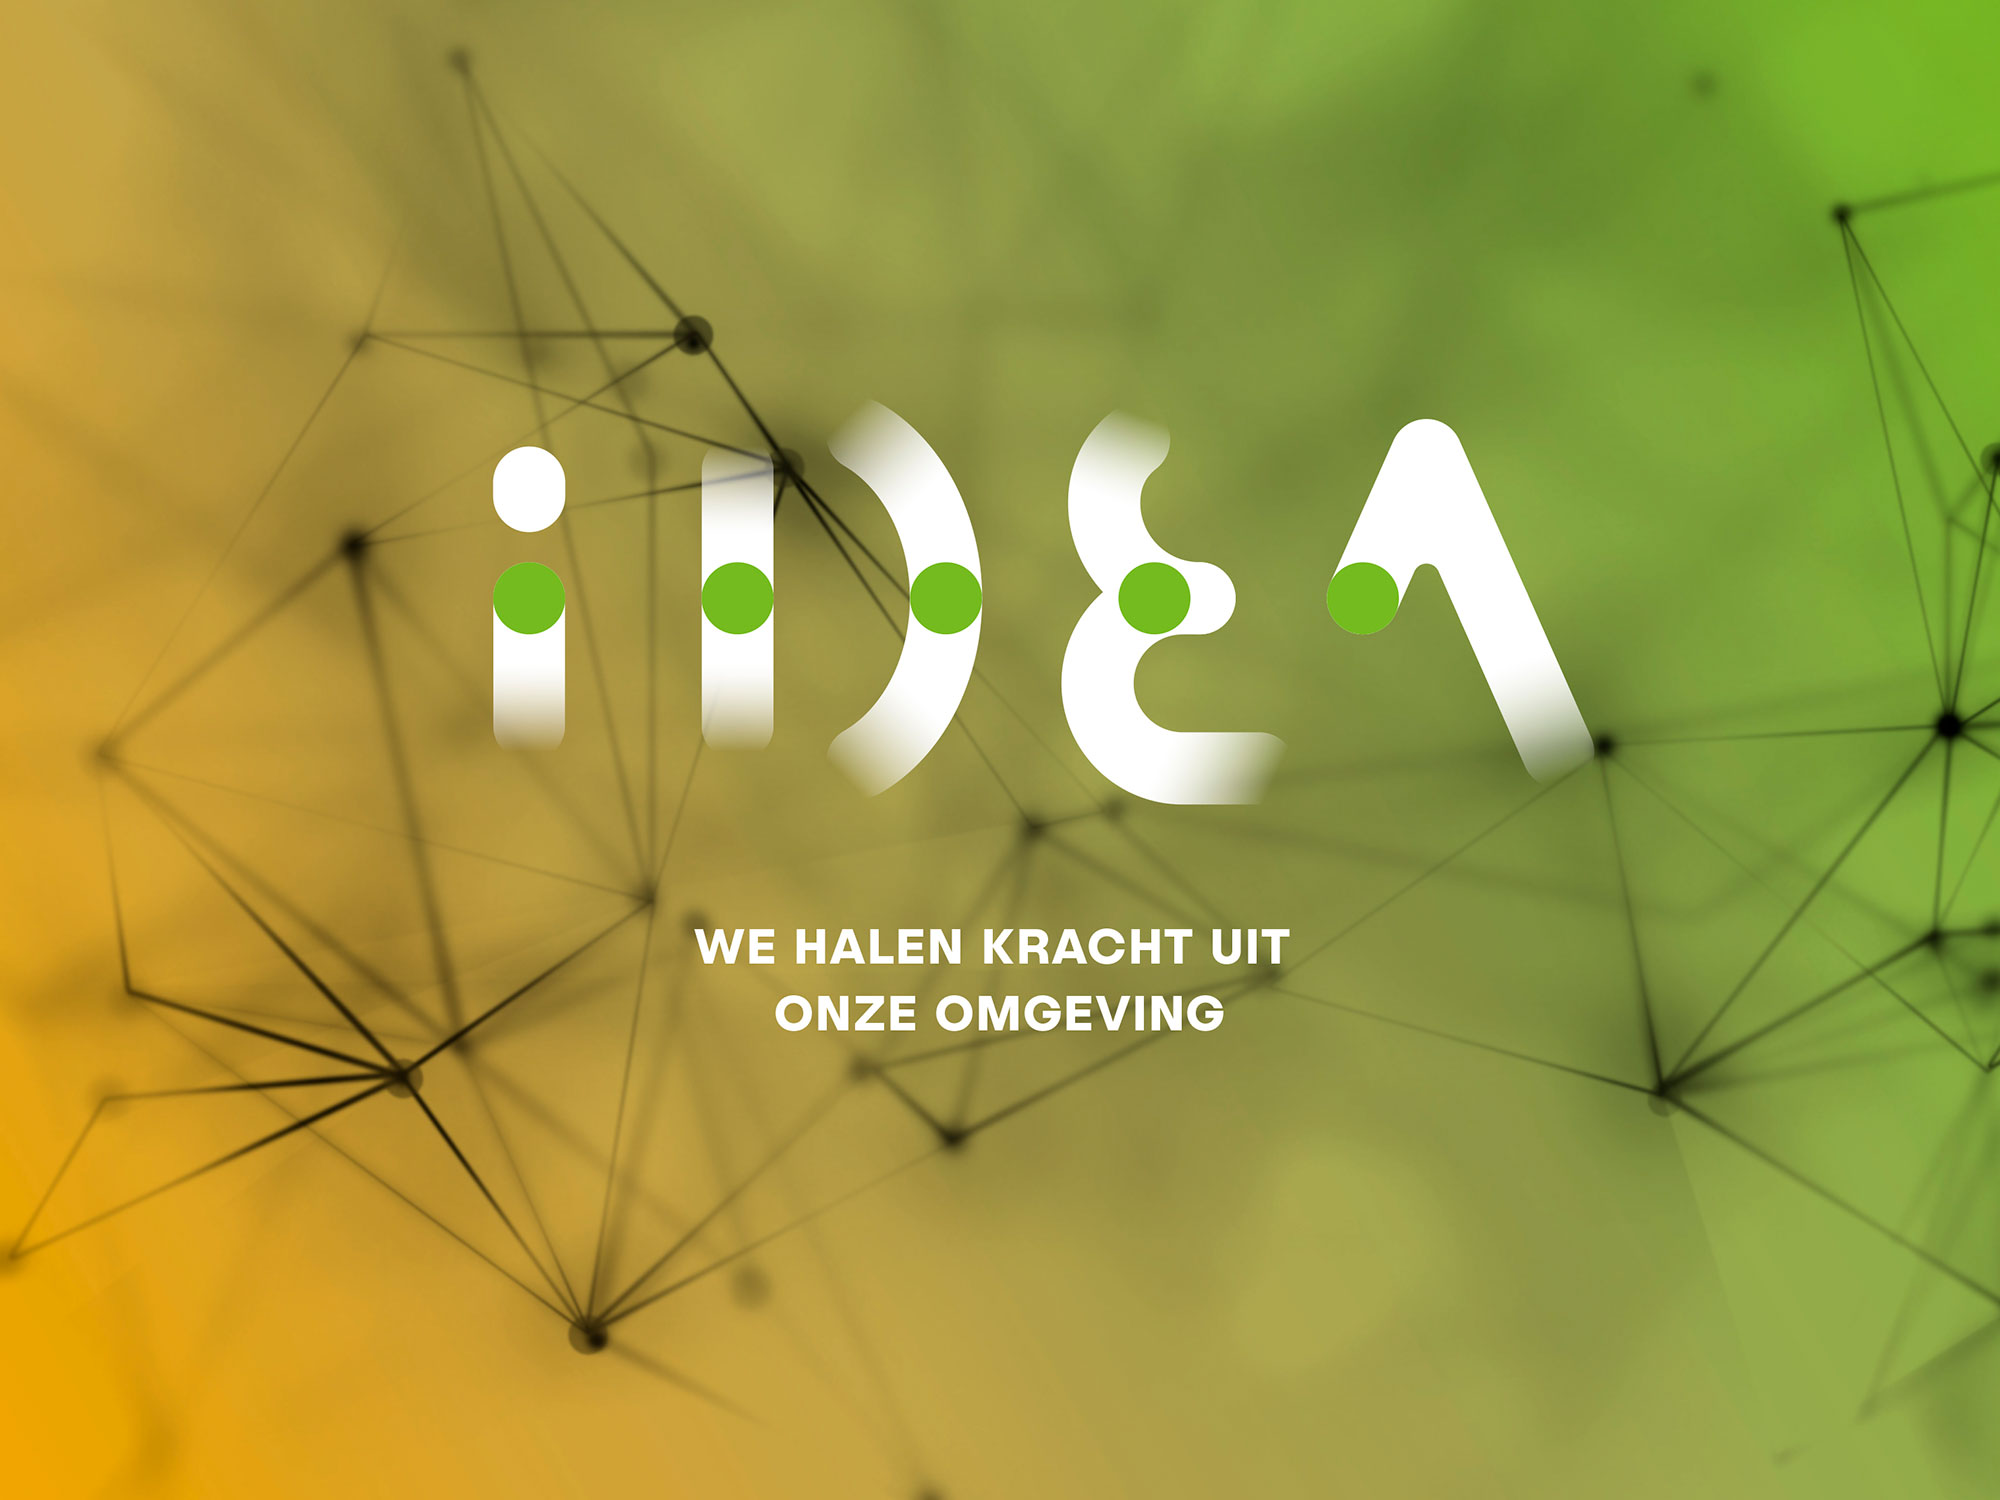 Impulsar-IDEA